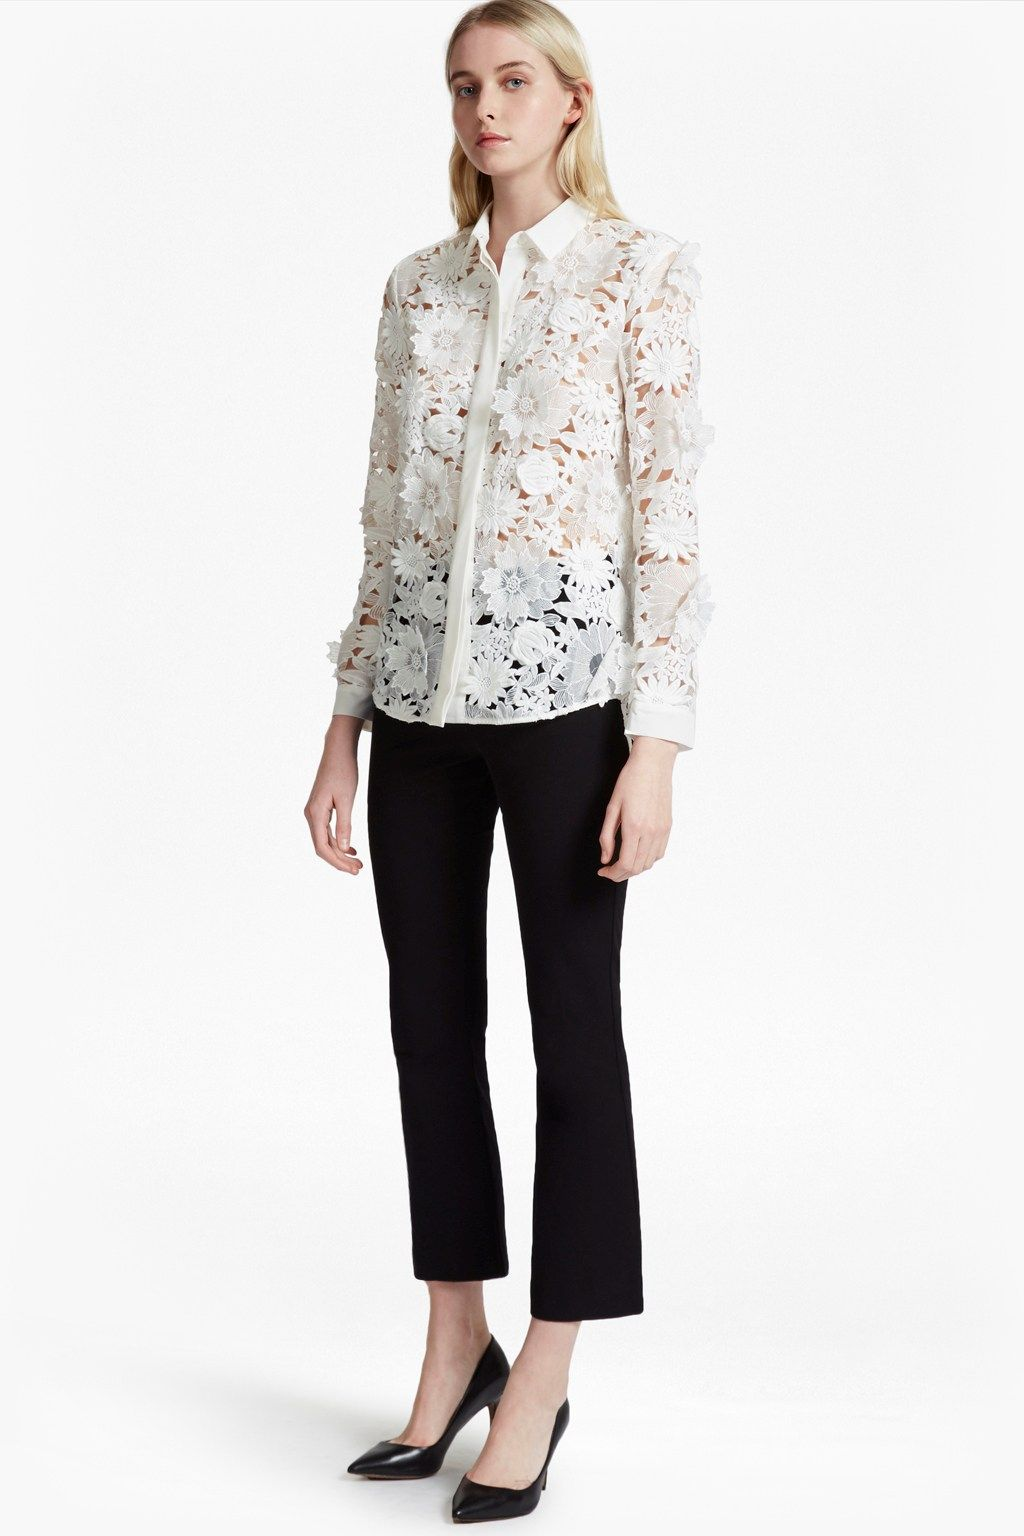 5b289b2c9758c Manzoni 3D Floral Lace Shirt | Blouses Shirts | French Connection Usa